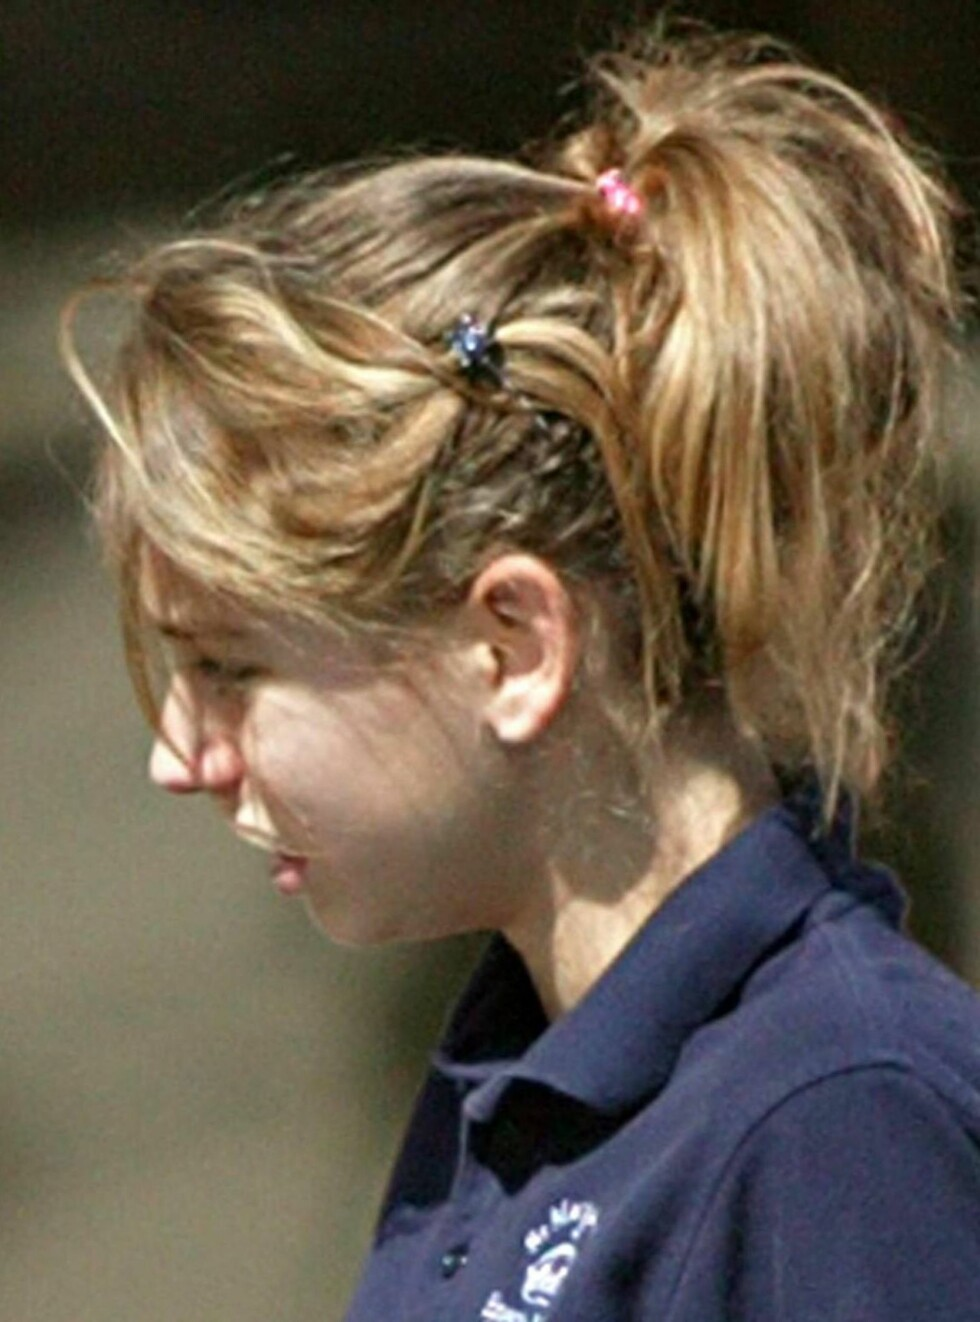 SØT: Hun er 14 år gammel, og har en meget berømt far. Jazmin har fått livet snudd på hodet! Foto: Stella Pictures